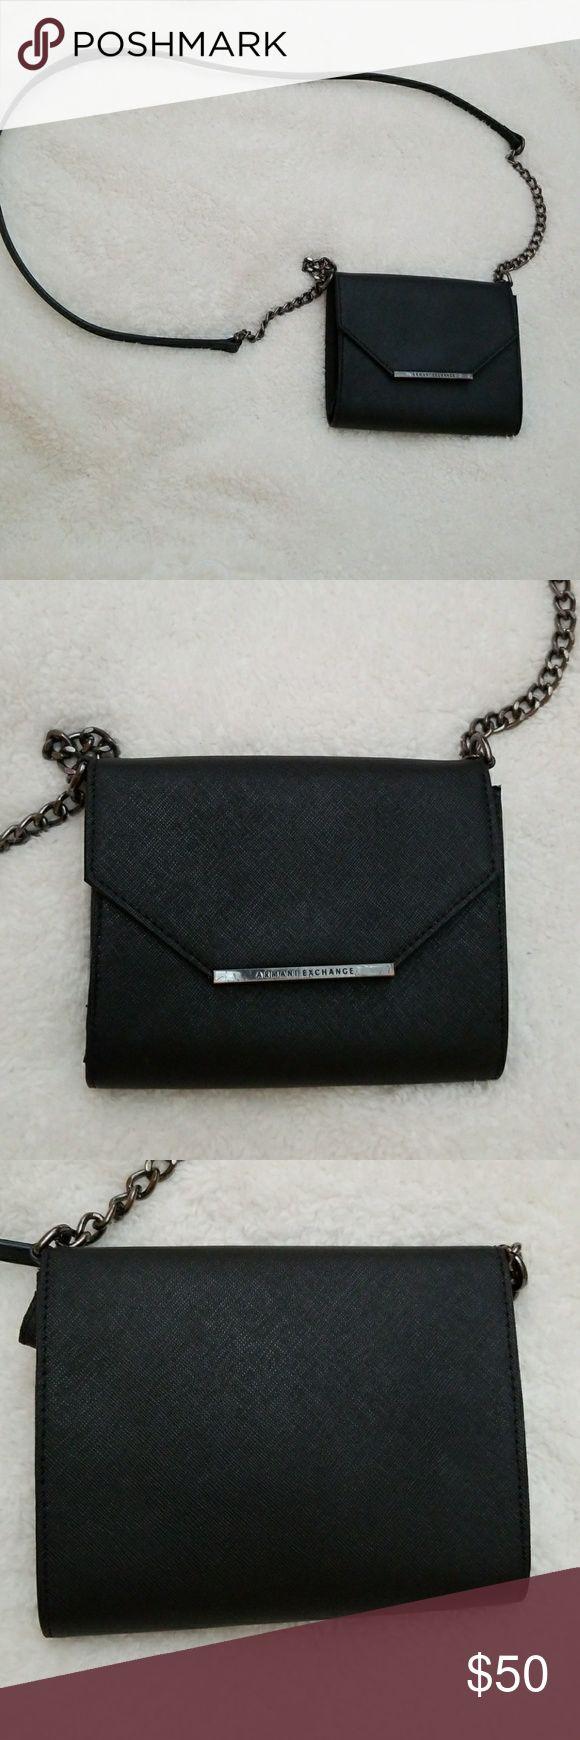 Armani Exchange Crossbody Purse Beautiful bag, ask away! Armani Exchange Bags Crossbody Bags